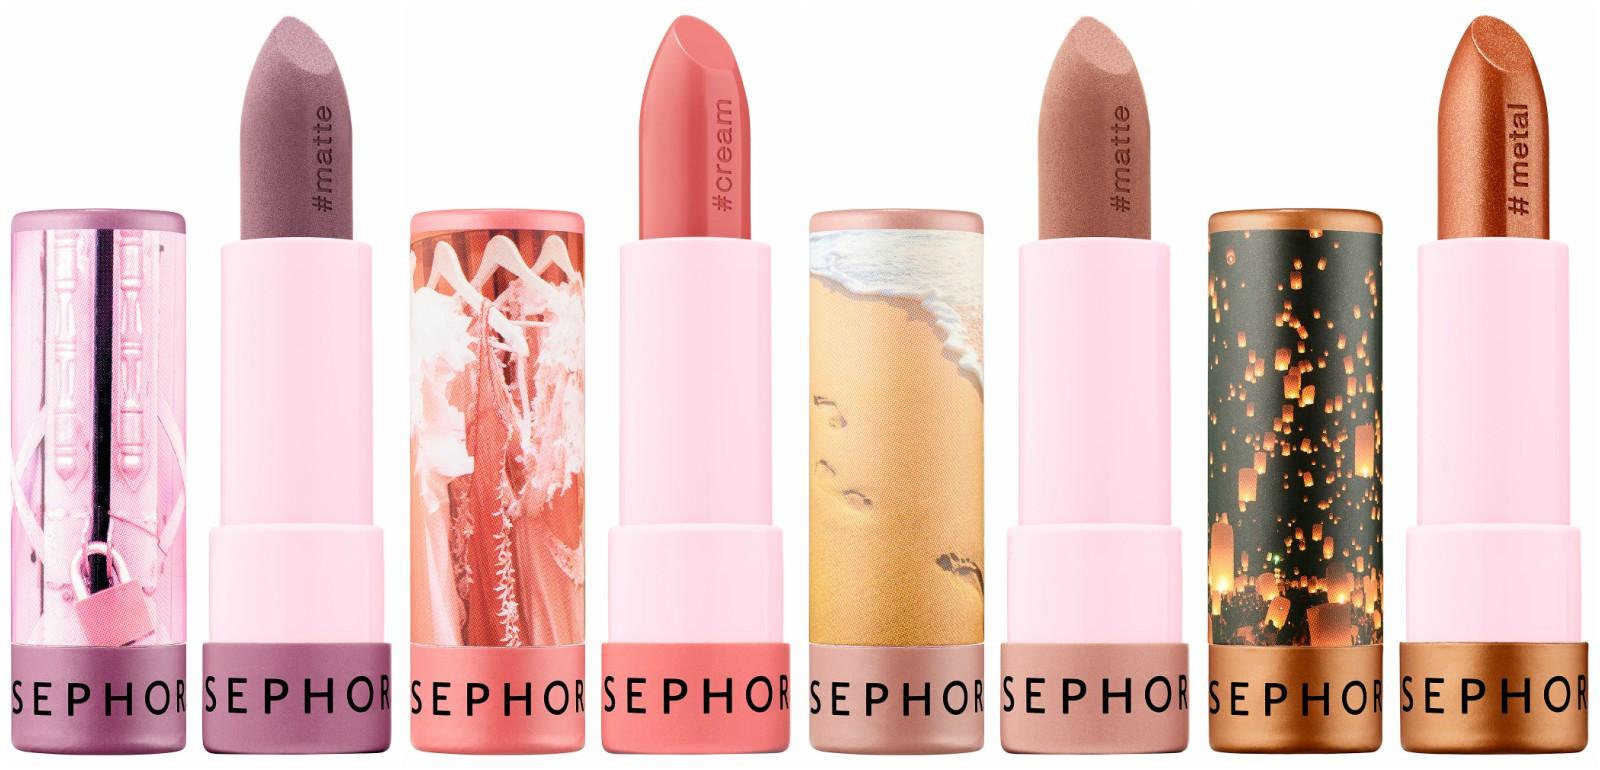 rossetti sephora lipstories